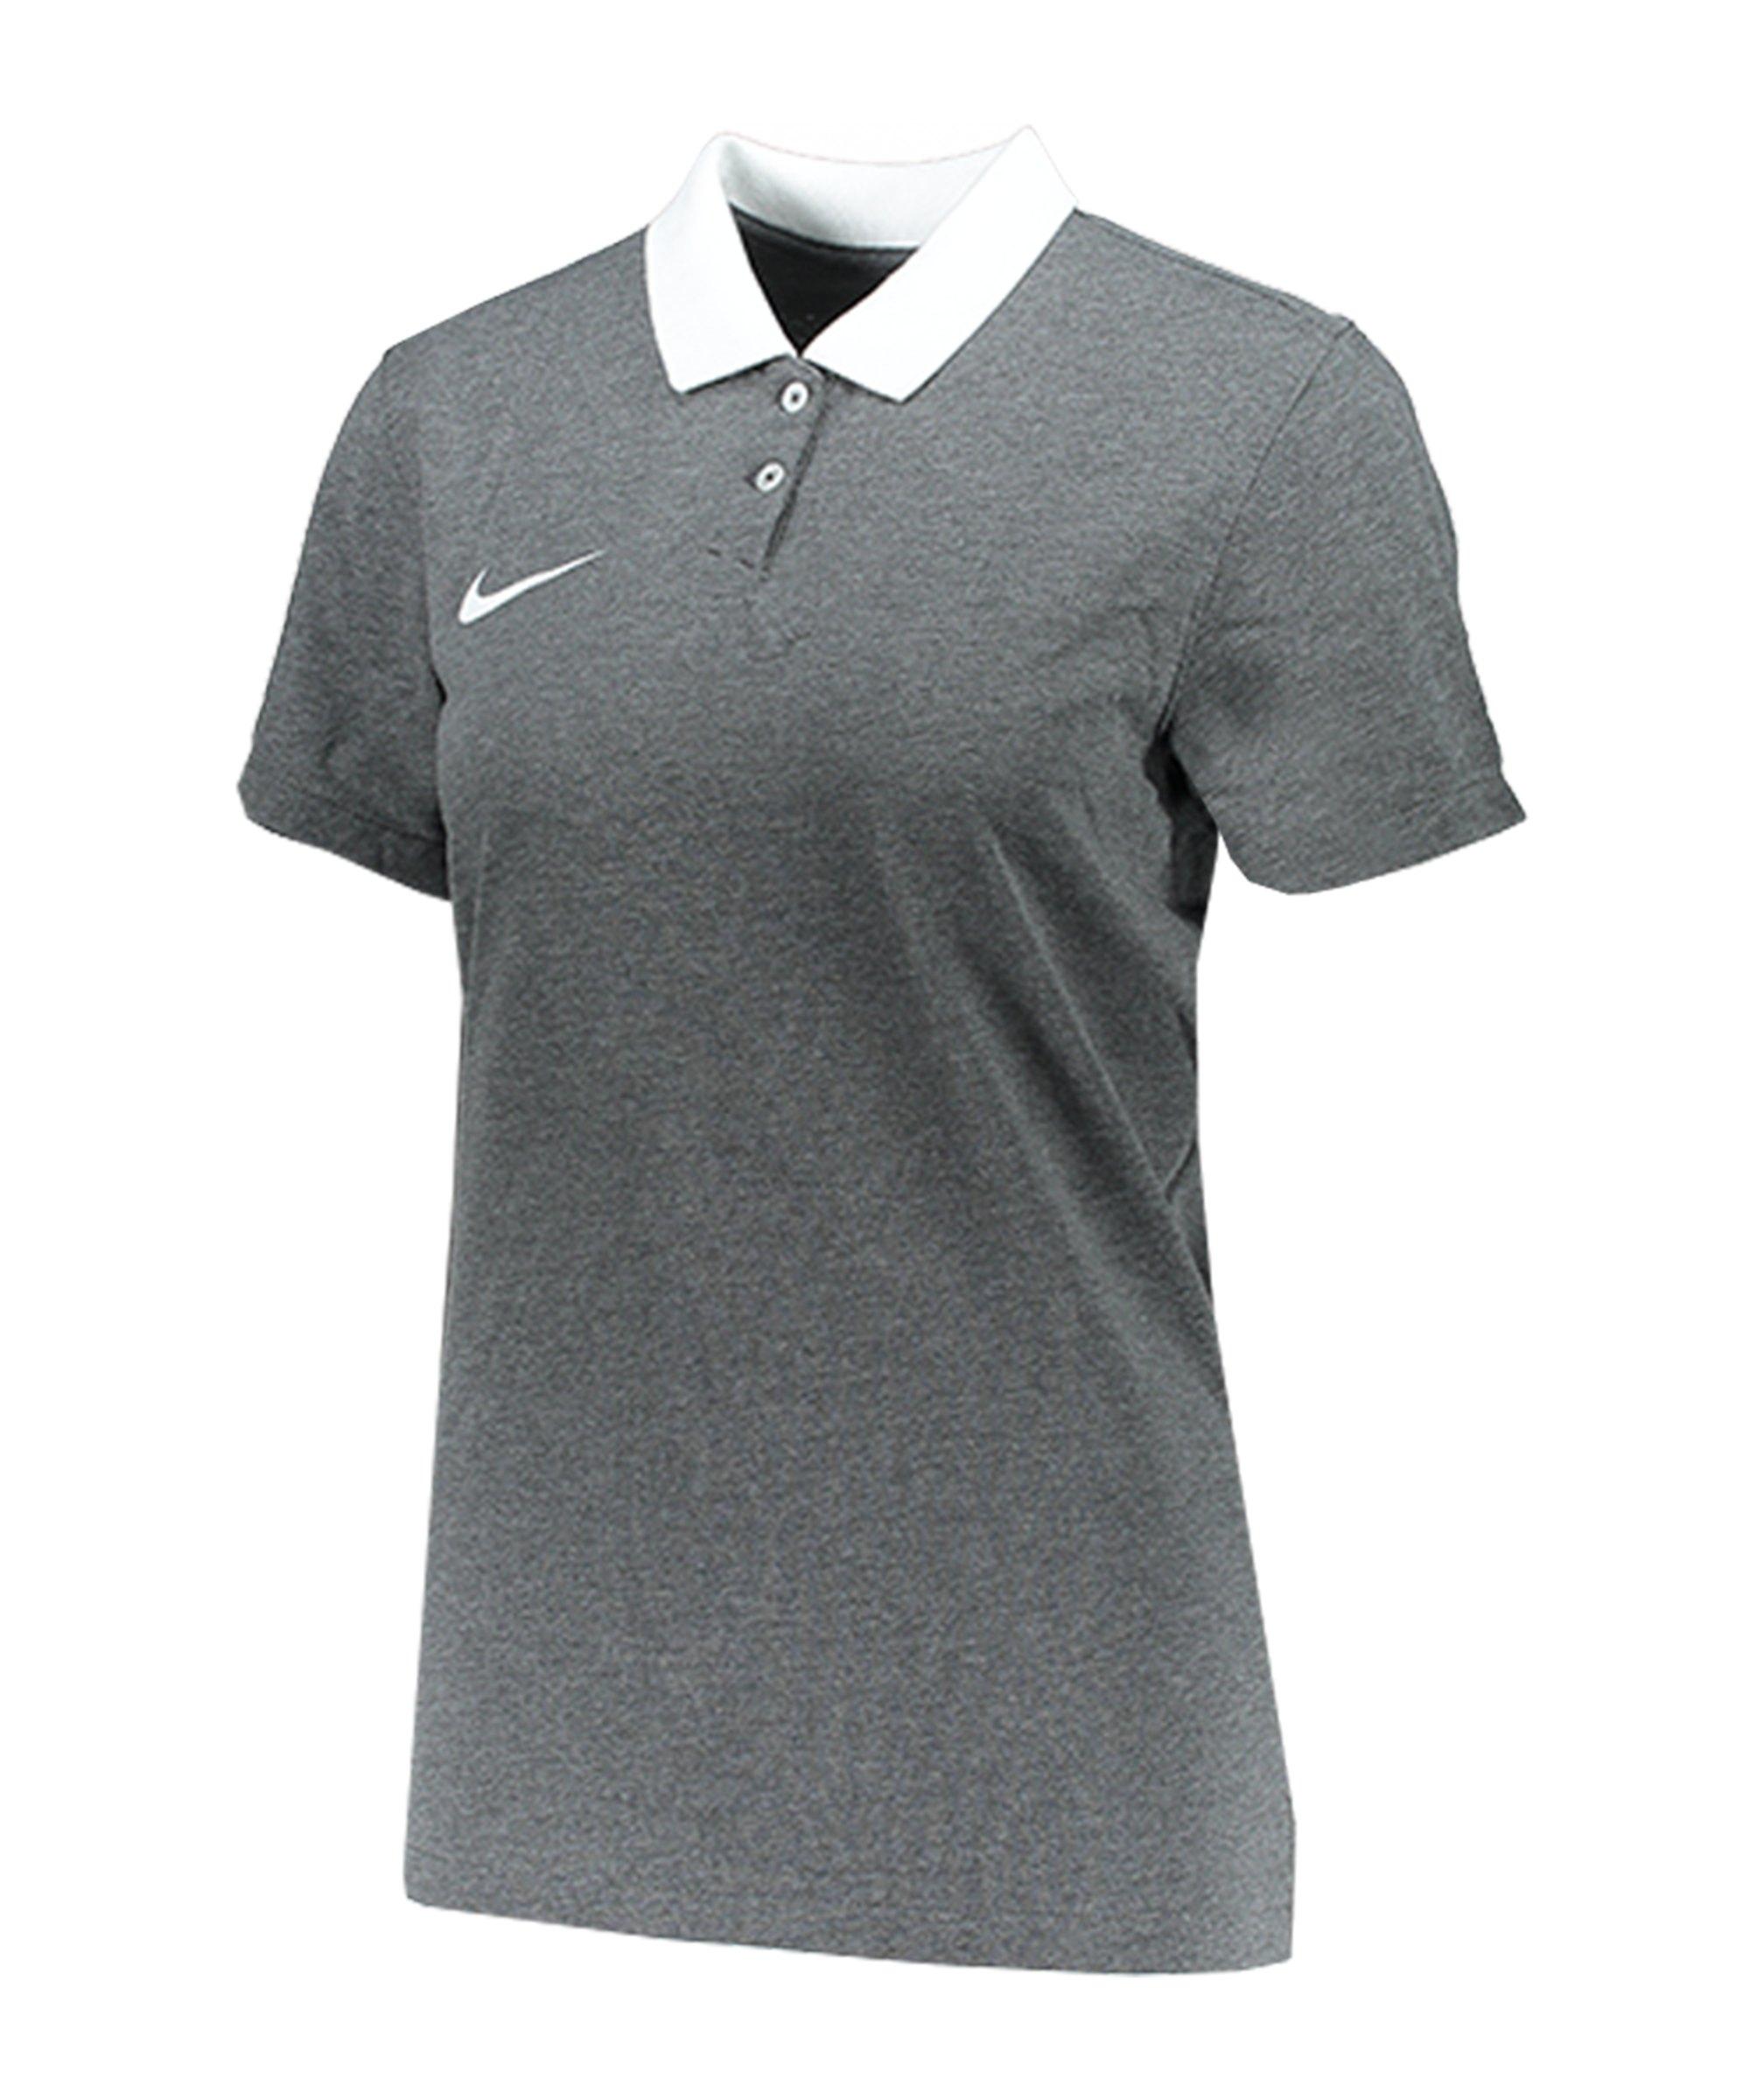 Nike Park 20 Poloshirt Damen Grau Weiss F071 - grau